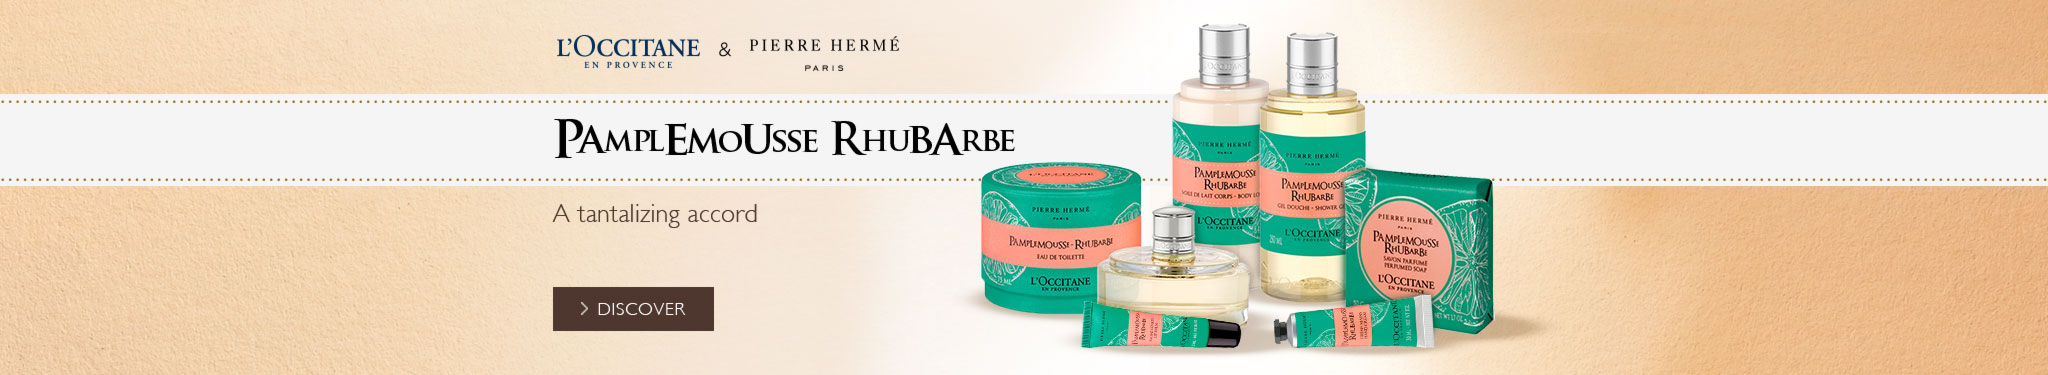 Pamplemousse Rhubarbe